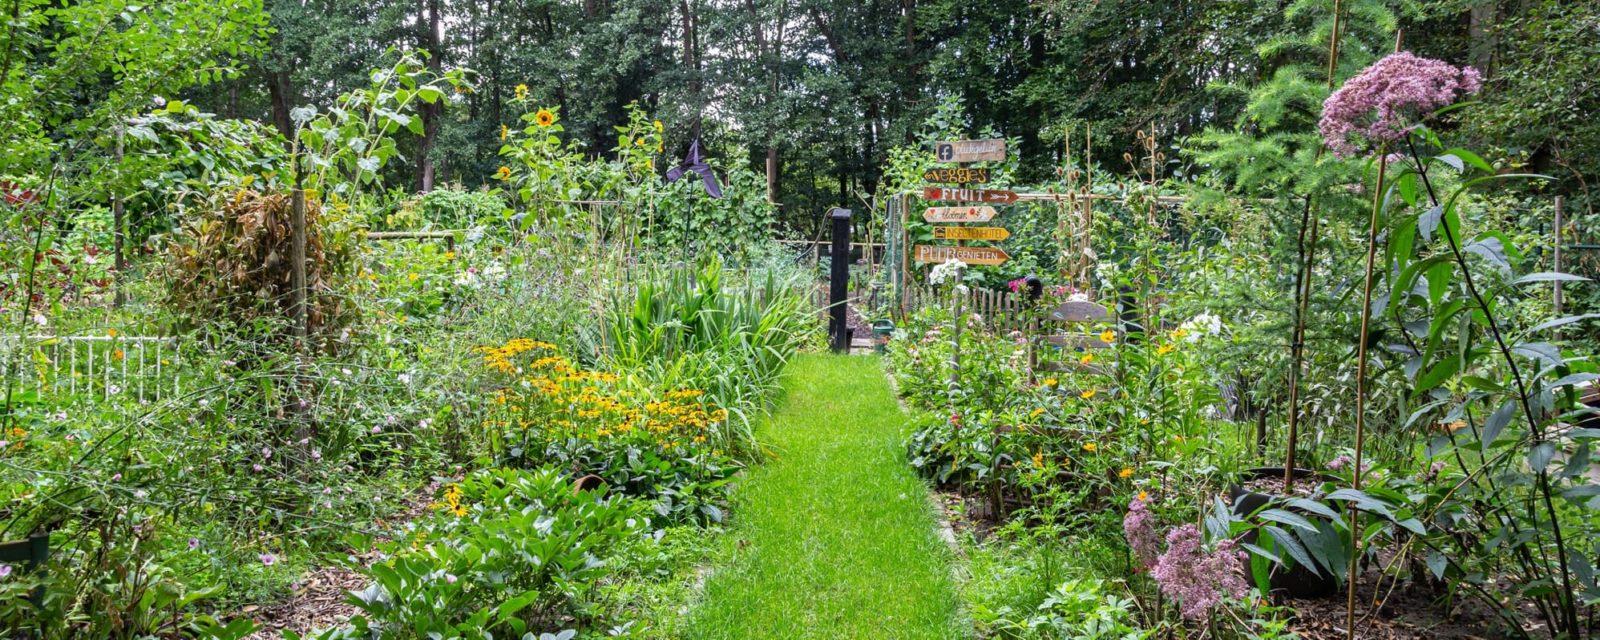 a vegetable garden in the august summer sun